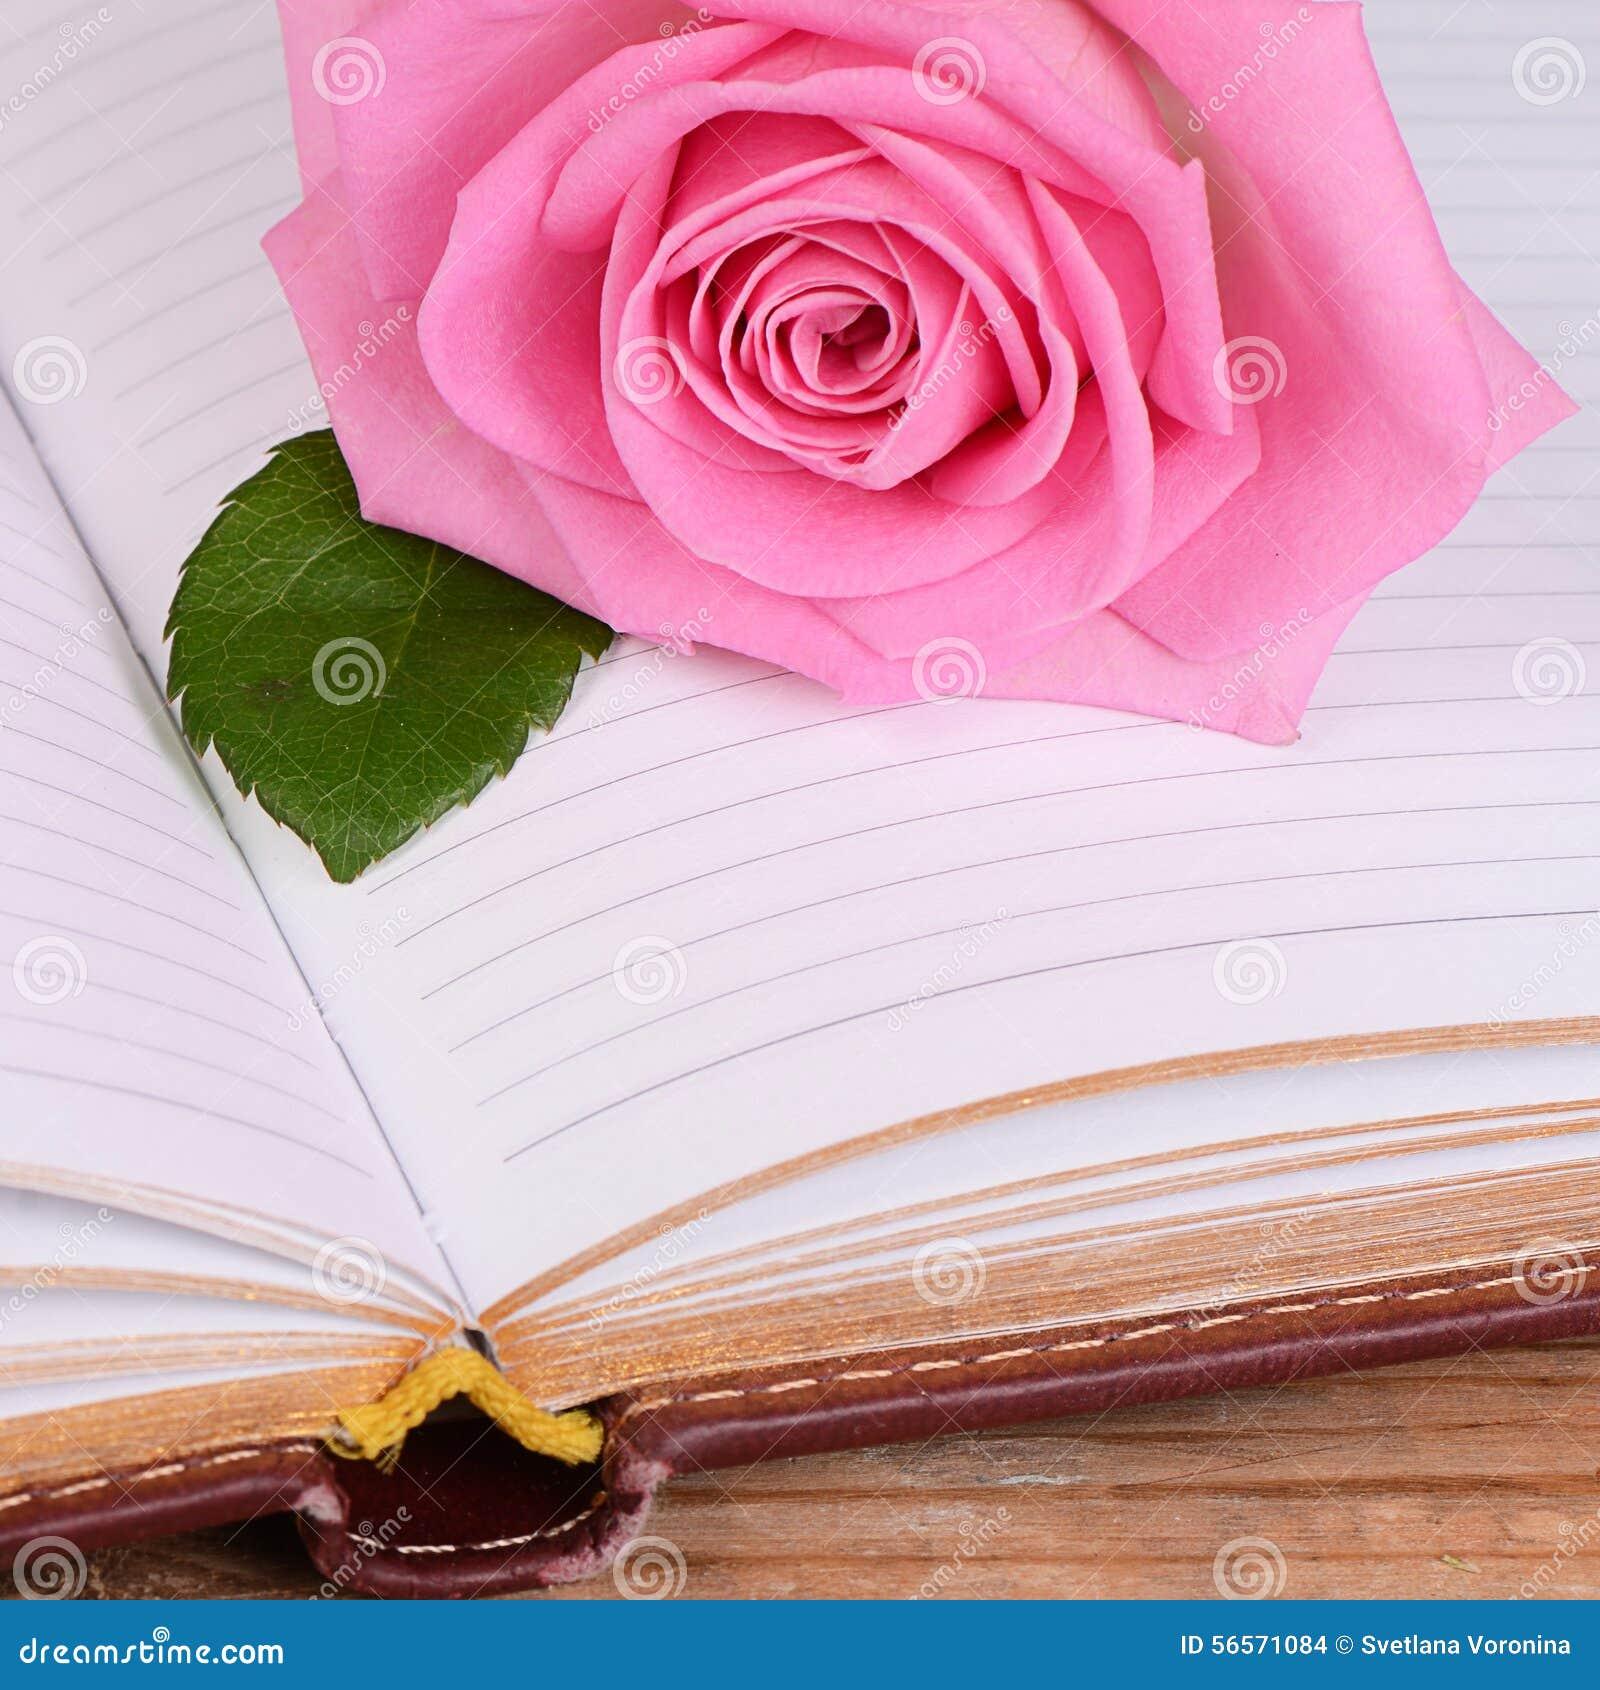 Download το βιβλίο αυξήθηκε στοκ εικόνες. εικόνα από έγγραφο, βιβλίων - 56571084